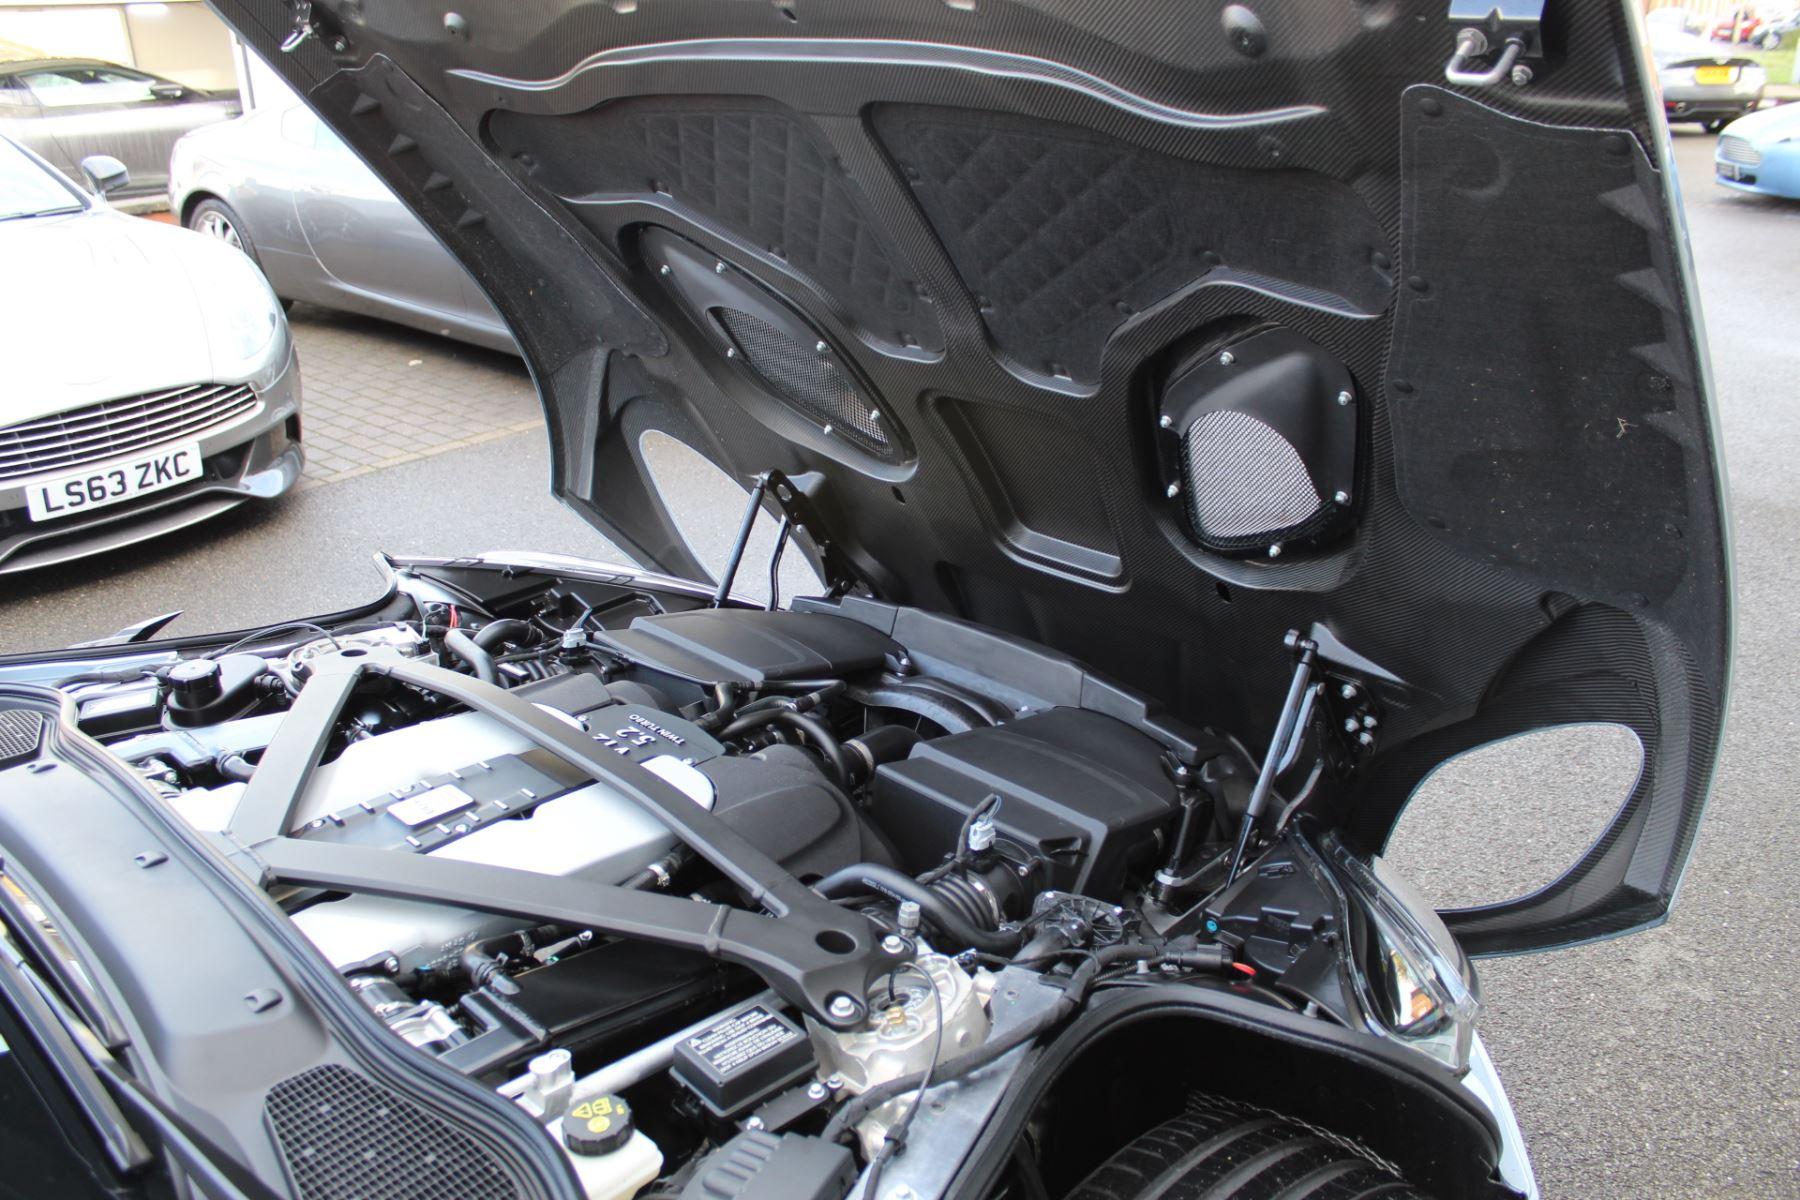 Aston Martin DBS Superleggera V12 2dr Touchtronic image 33